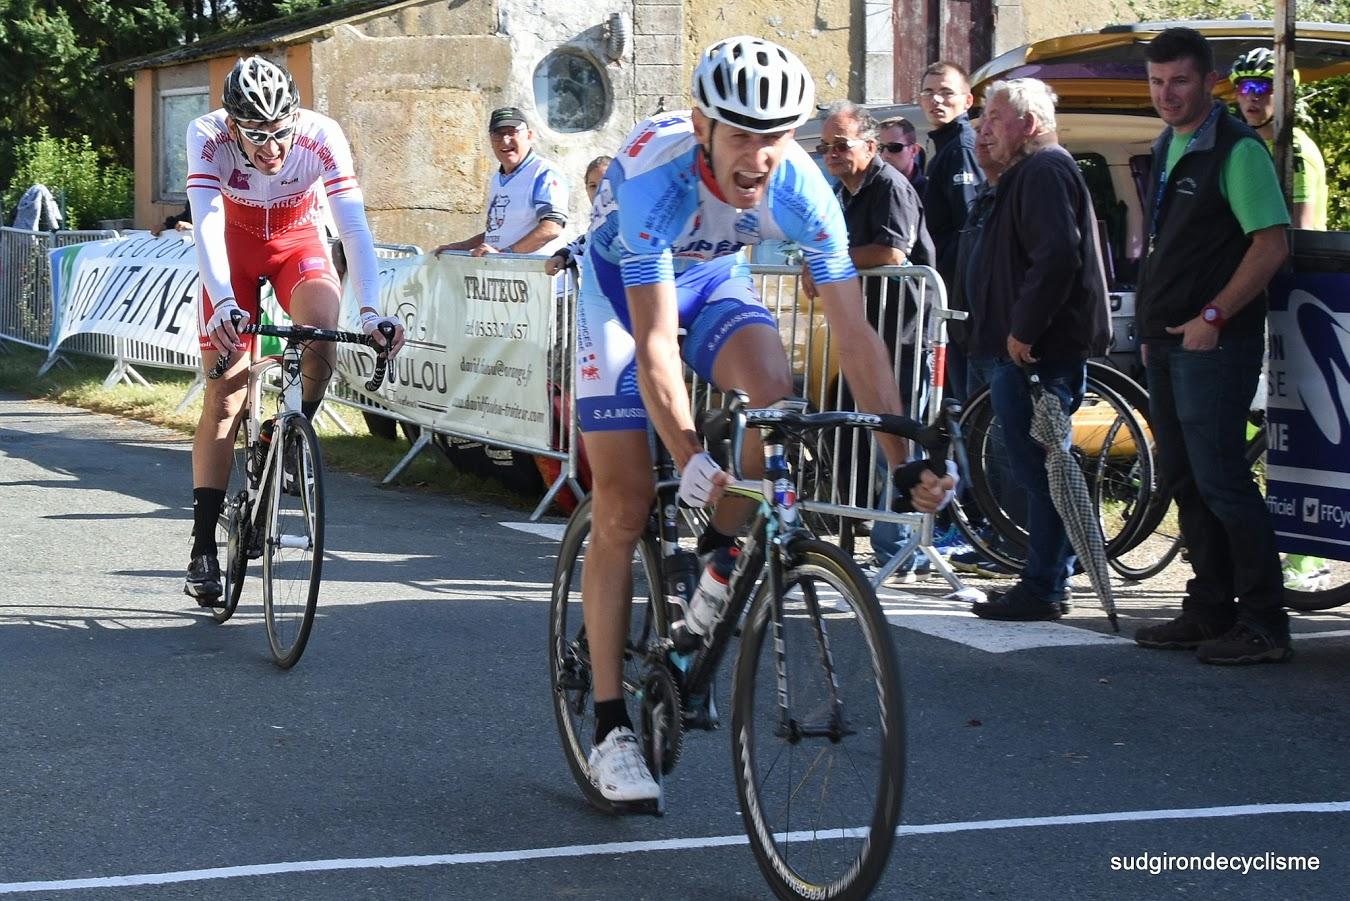 Cyril Fontayne, winning a race earlier this season  (Photo courtesy of sudgirondecyclisme)